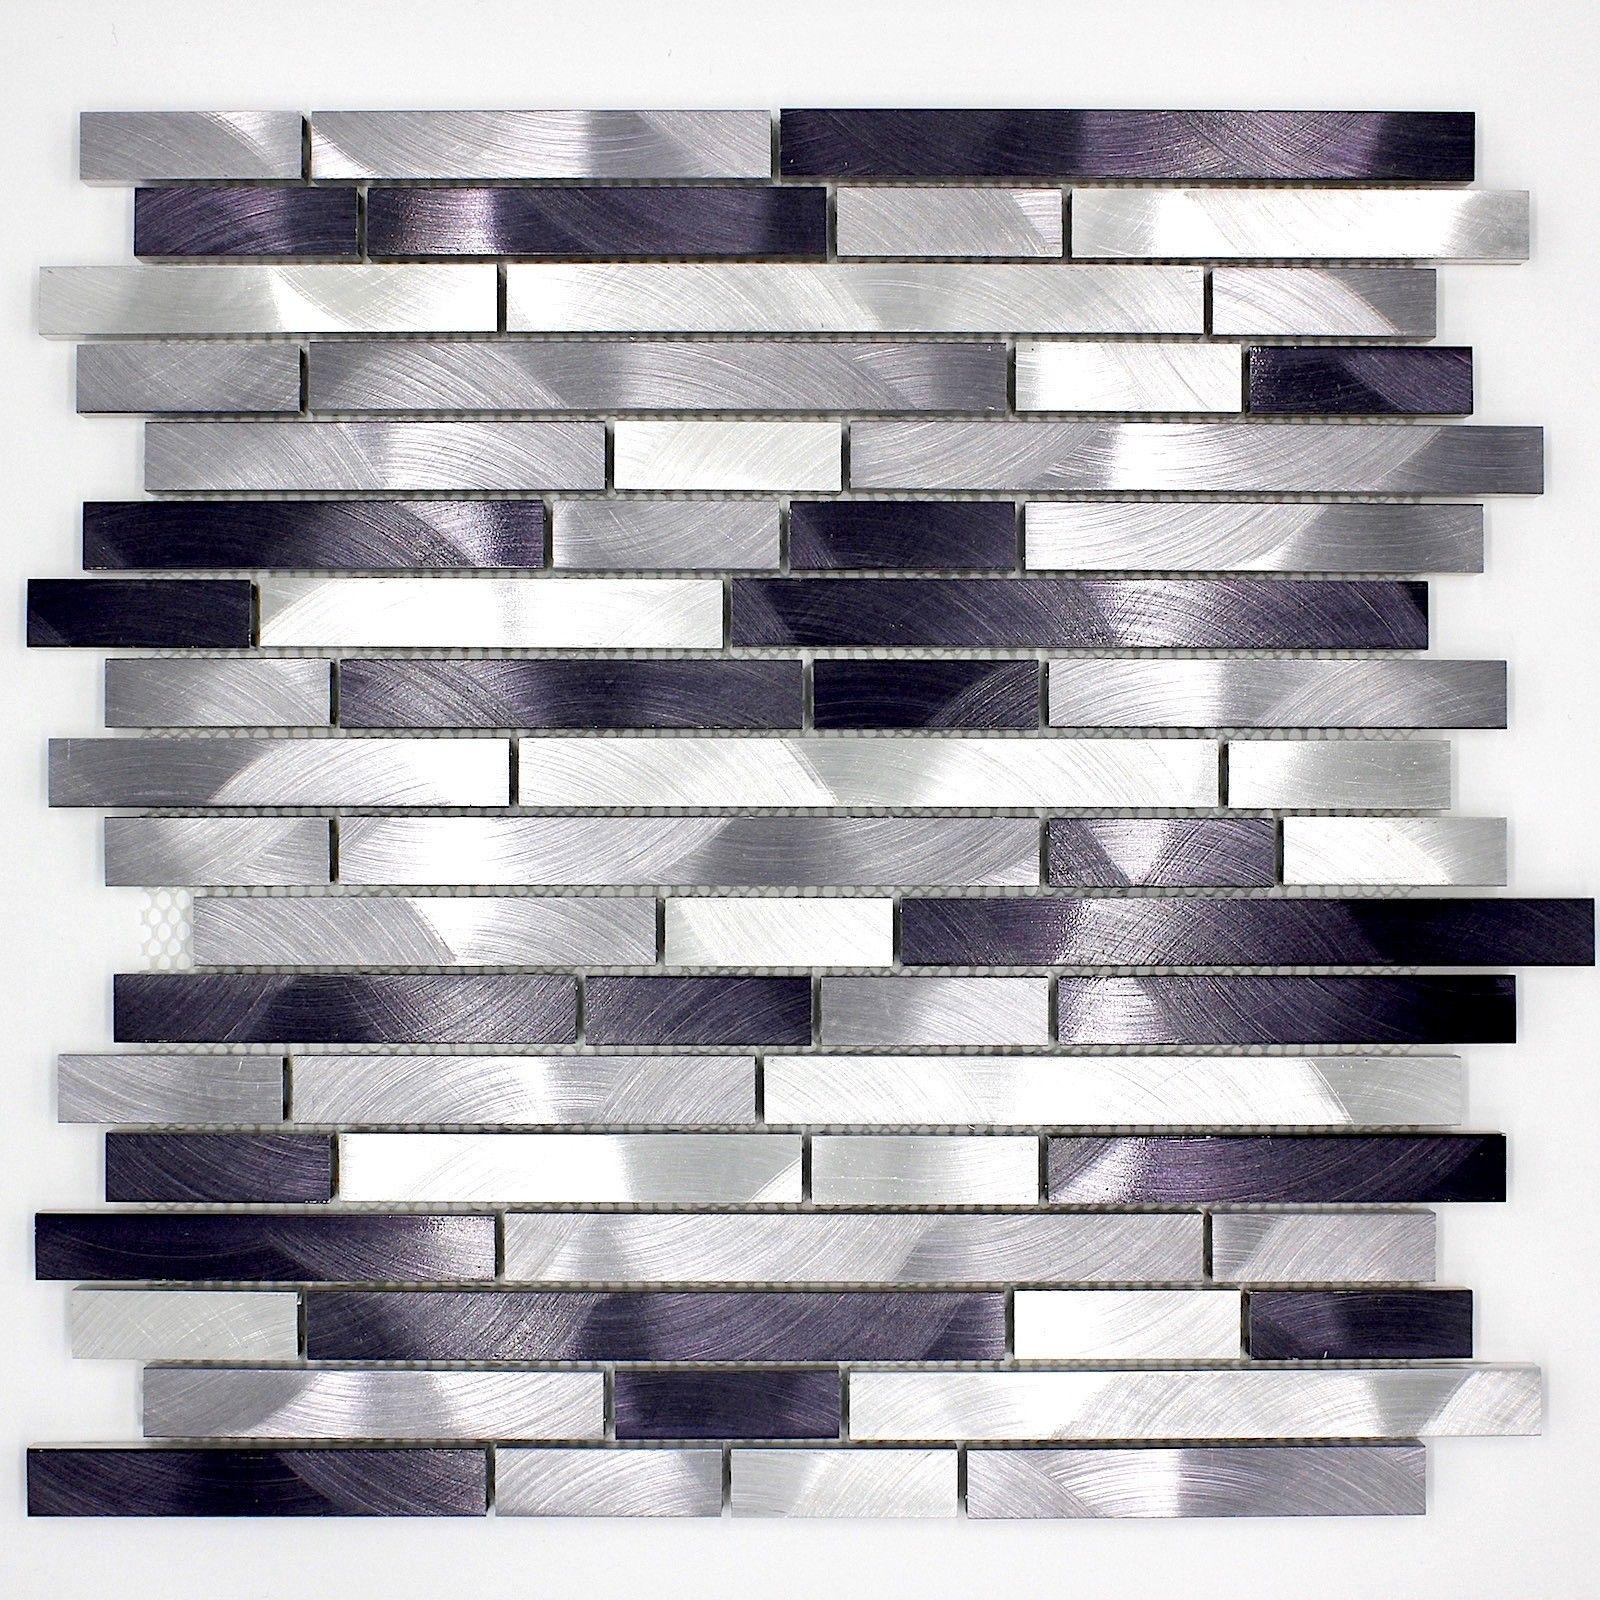 Gedeckten Tisch Kuche Fliesen Aluminium Mablegri Länge - Fliesen 80 x 30